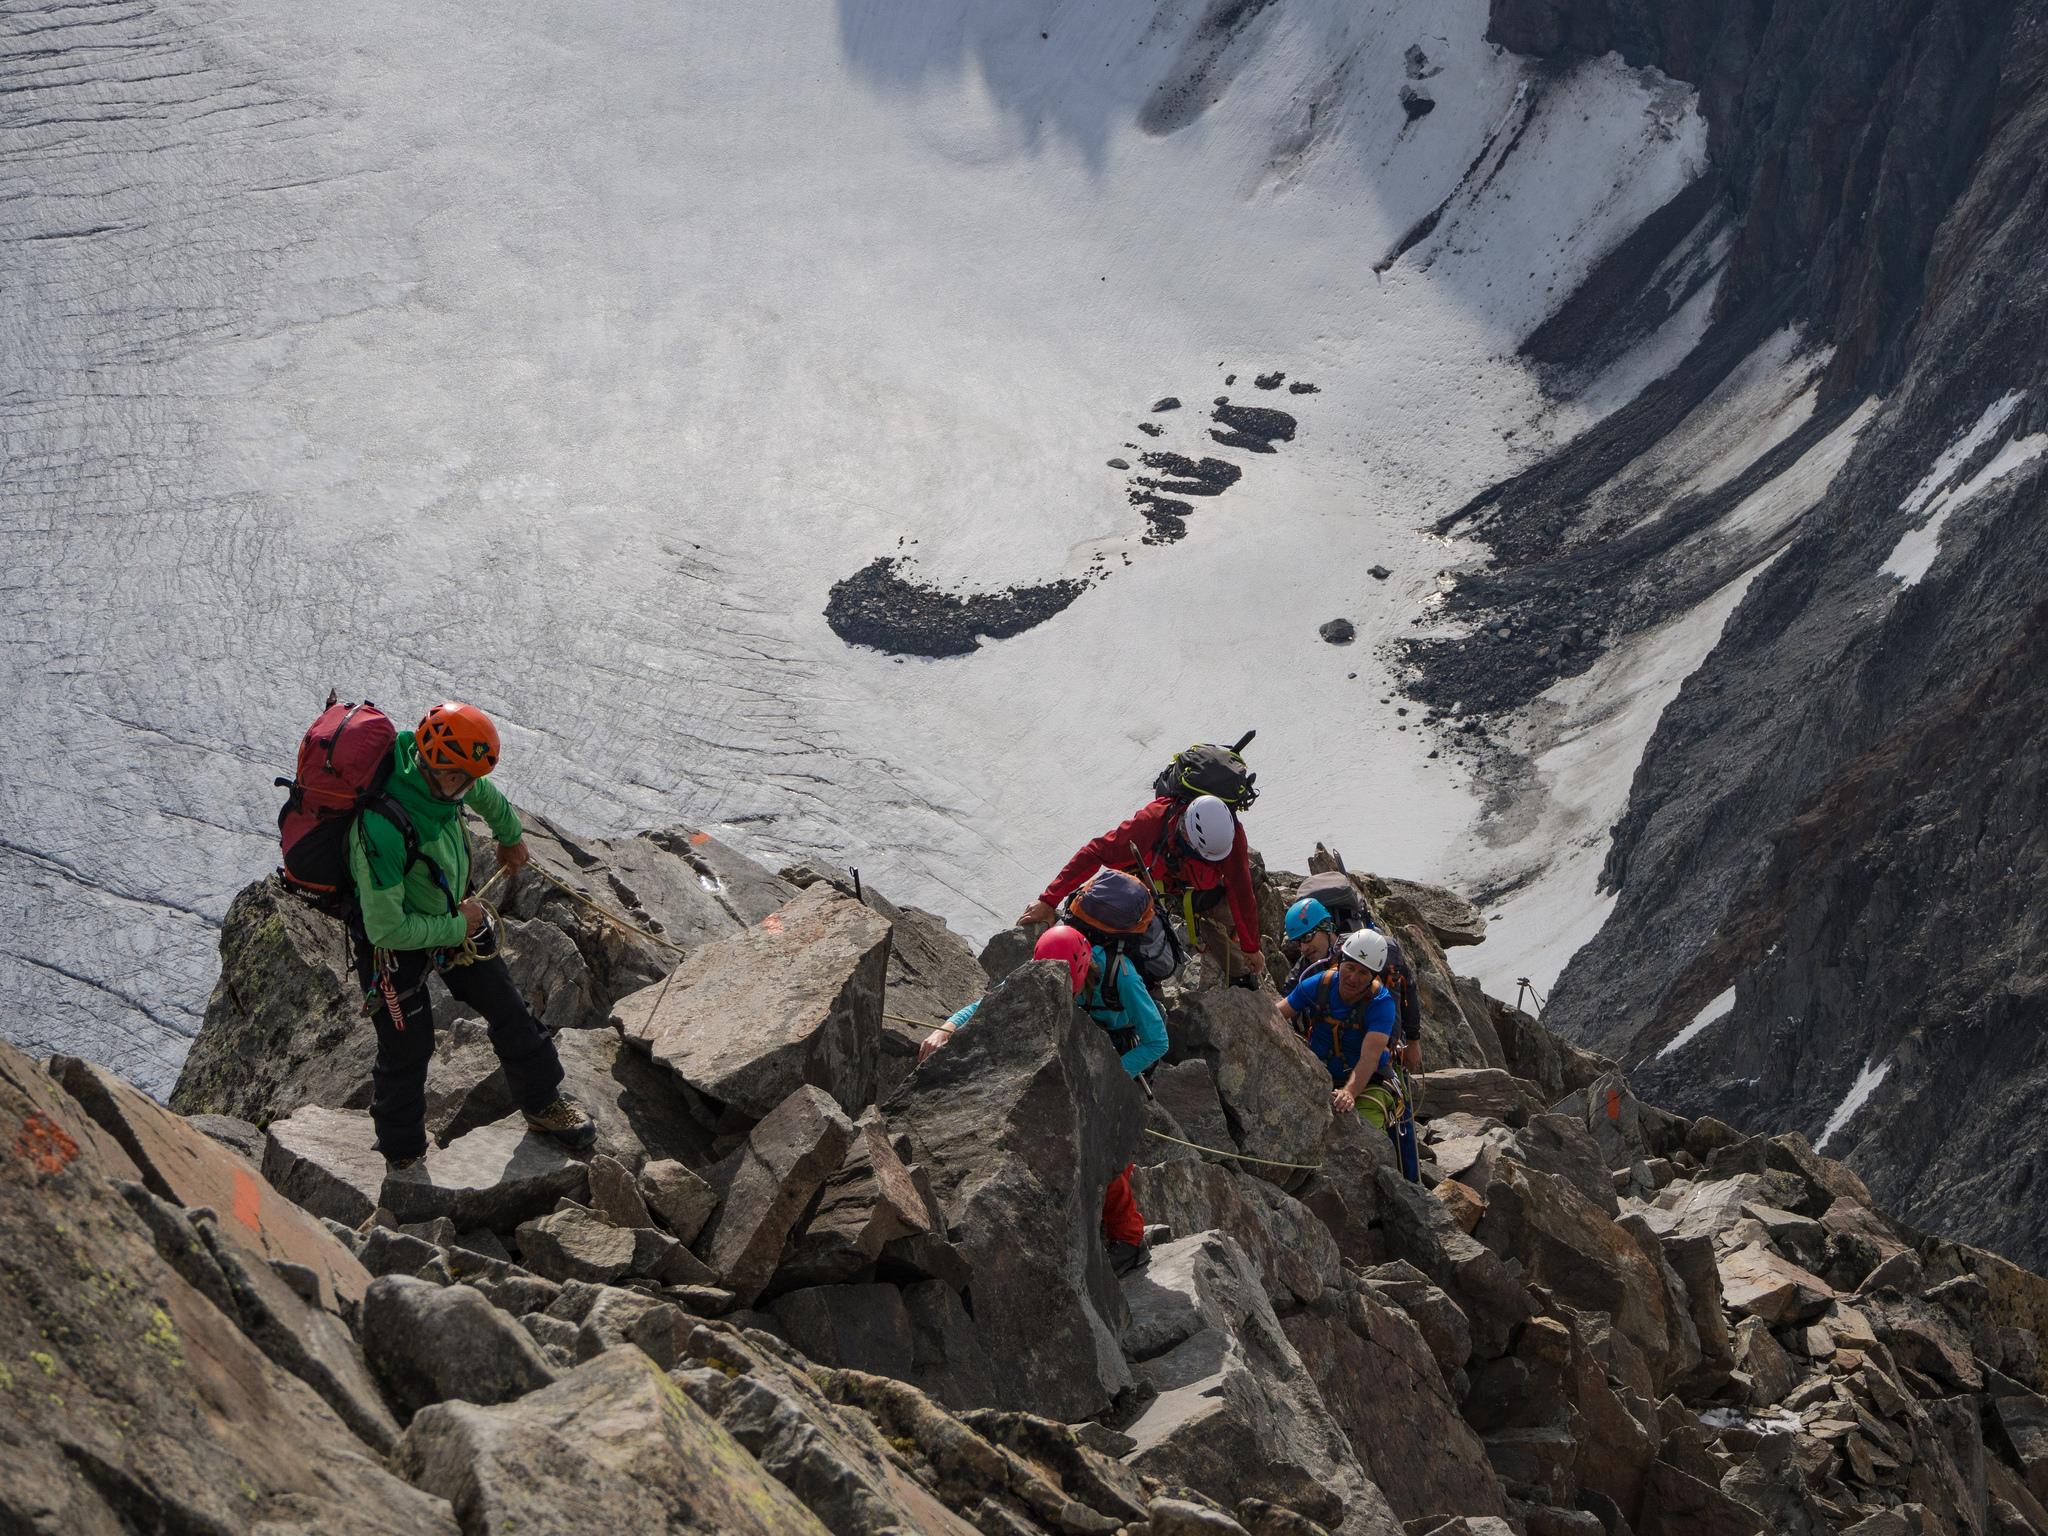 Klettersteigset Funktionsweise : Bergsteigen dav landau